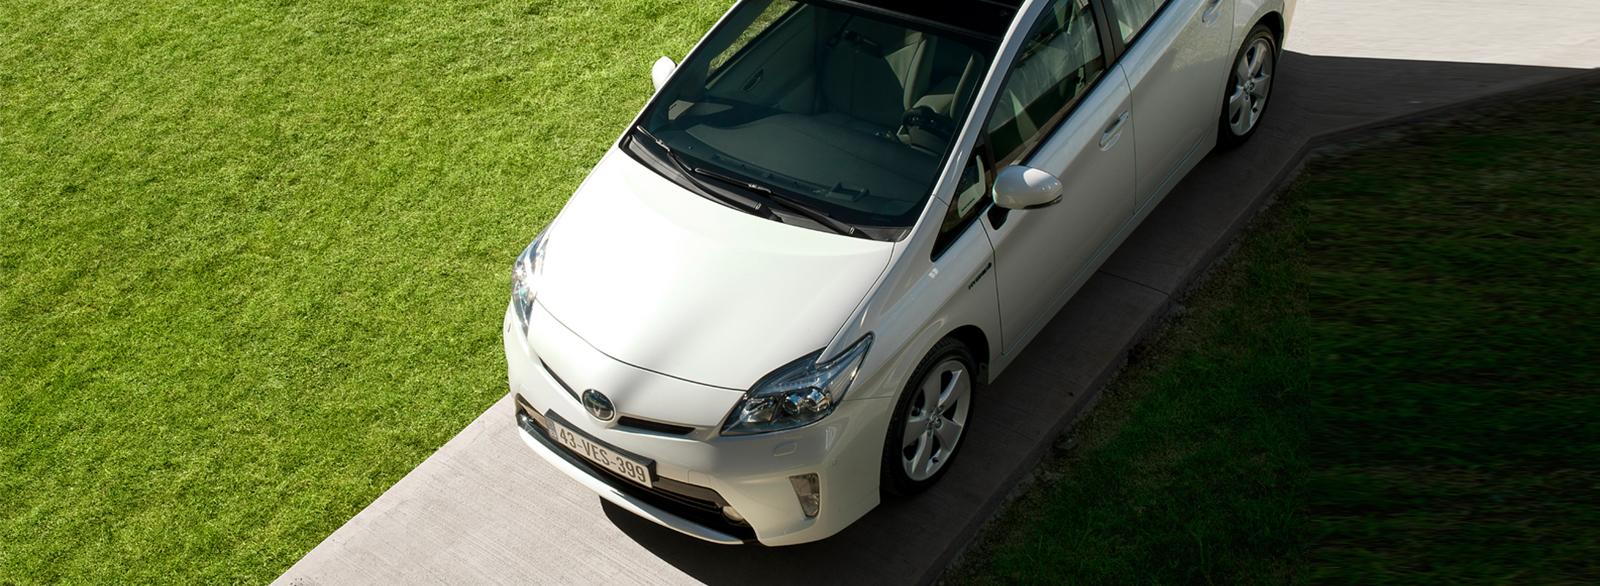 prius-exterior-img3